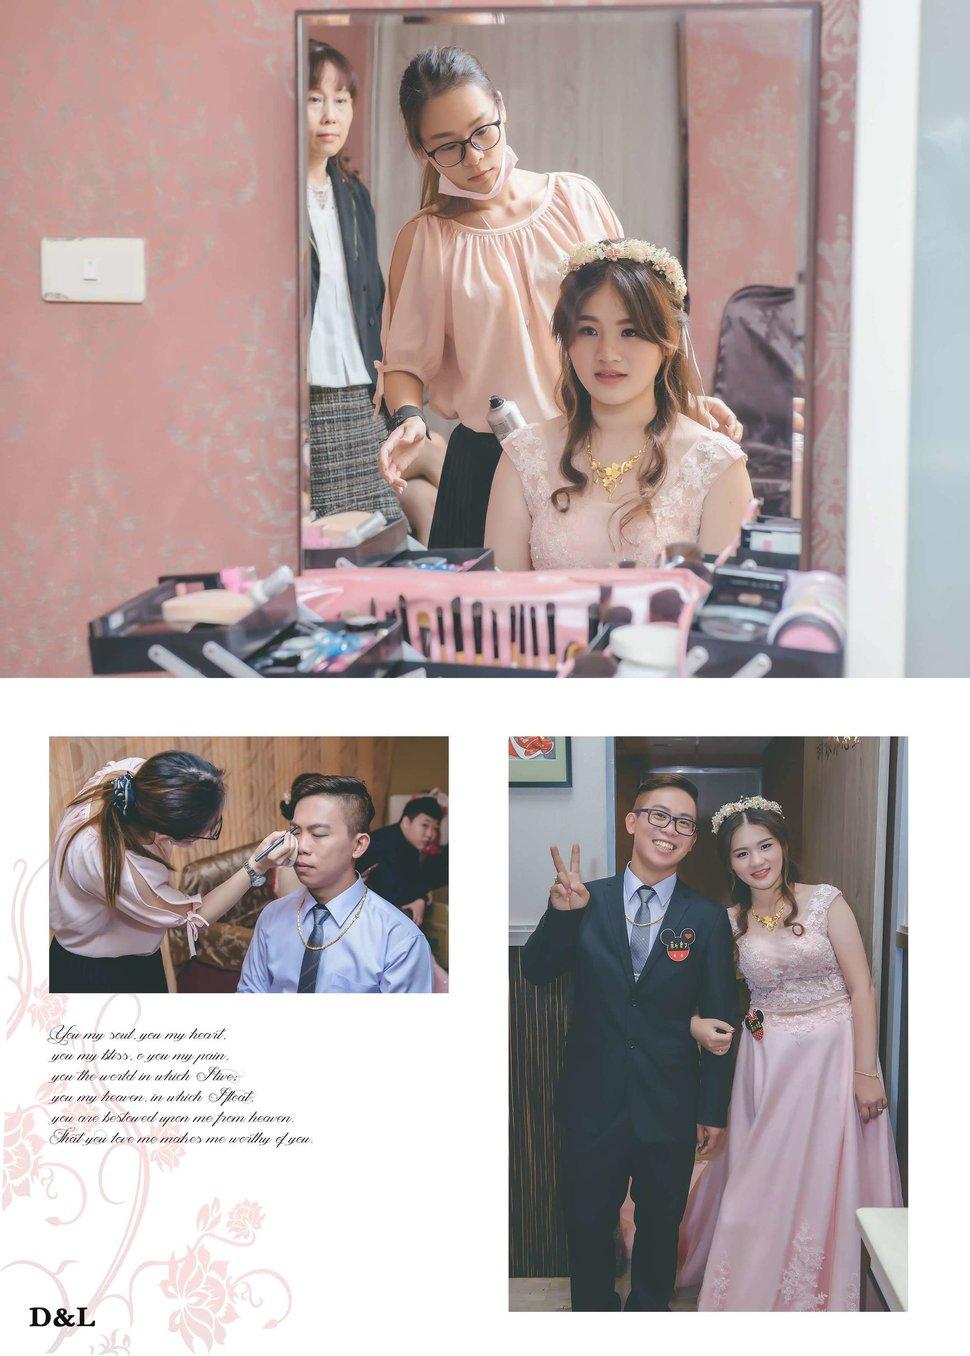 25 - D&L 婚禮事務 · 婚禮婚紗攝影 - 結婚吧